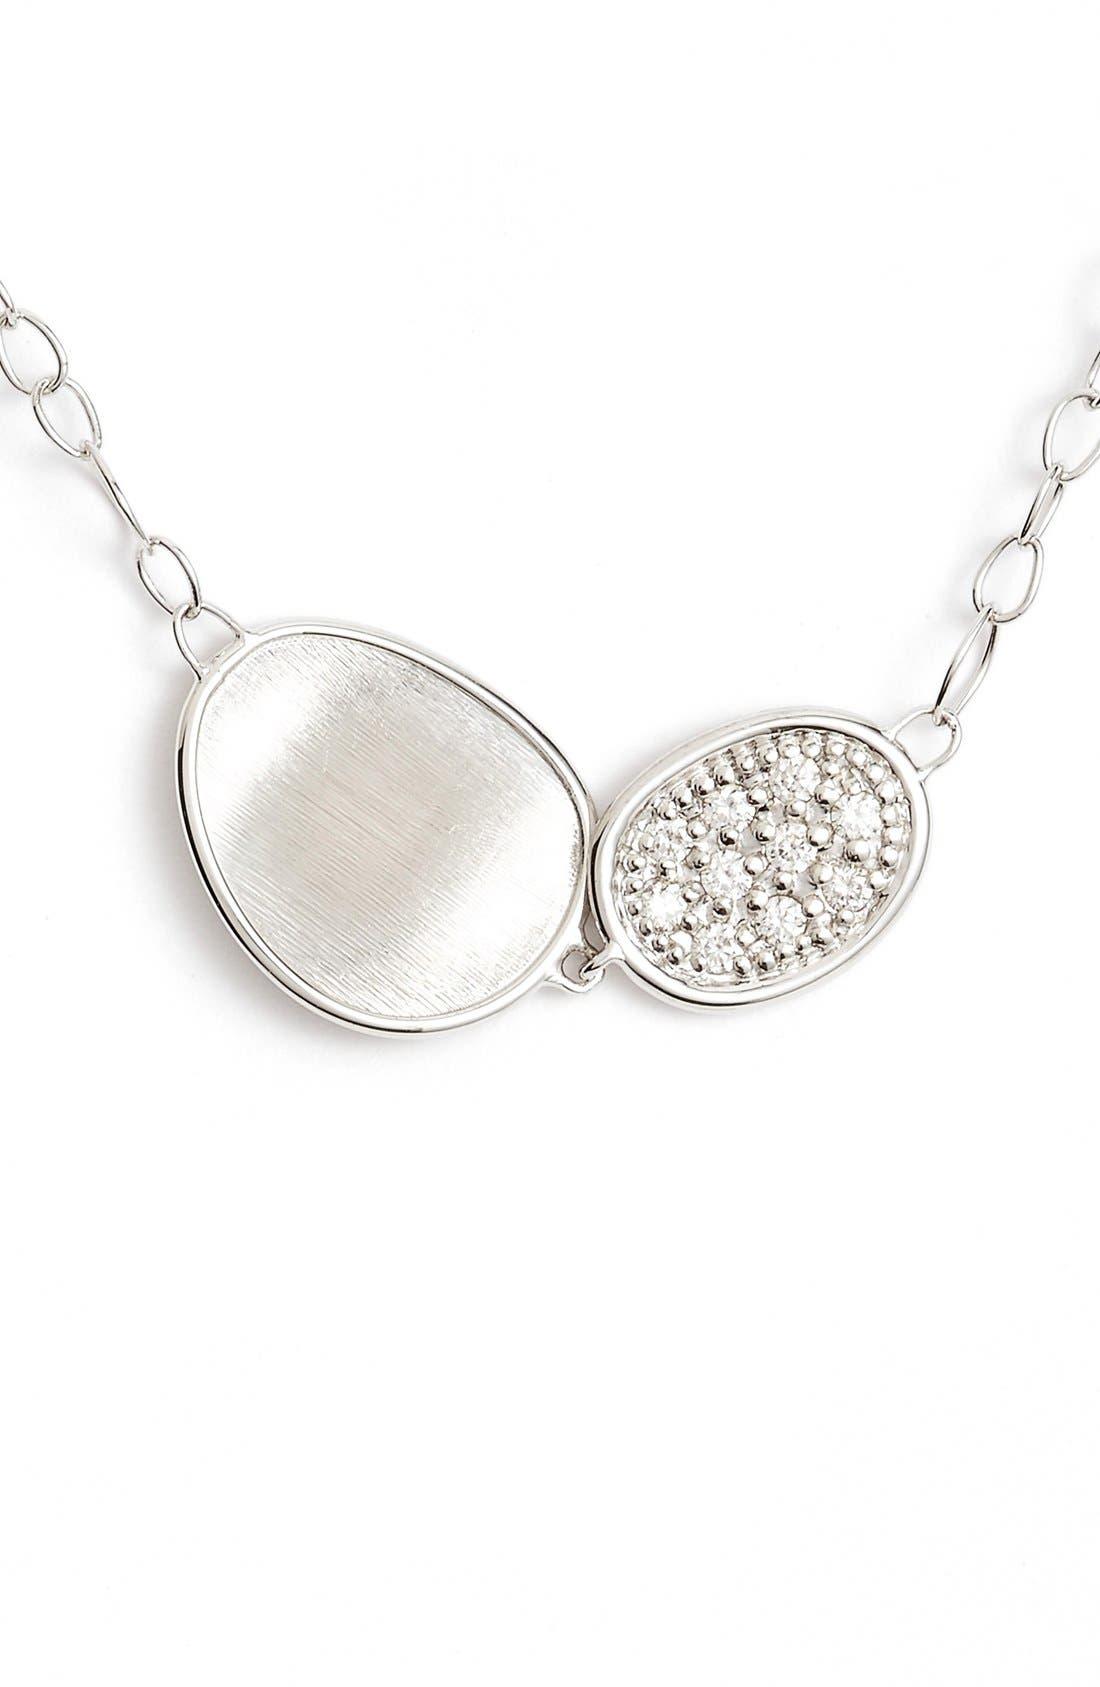 Main Image - Marco Bicego Lunaria Pendant Necklace